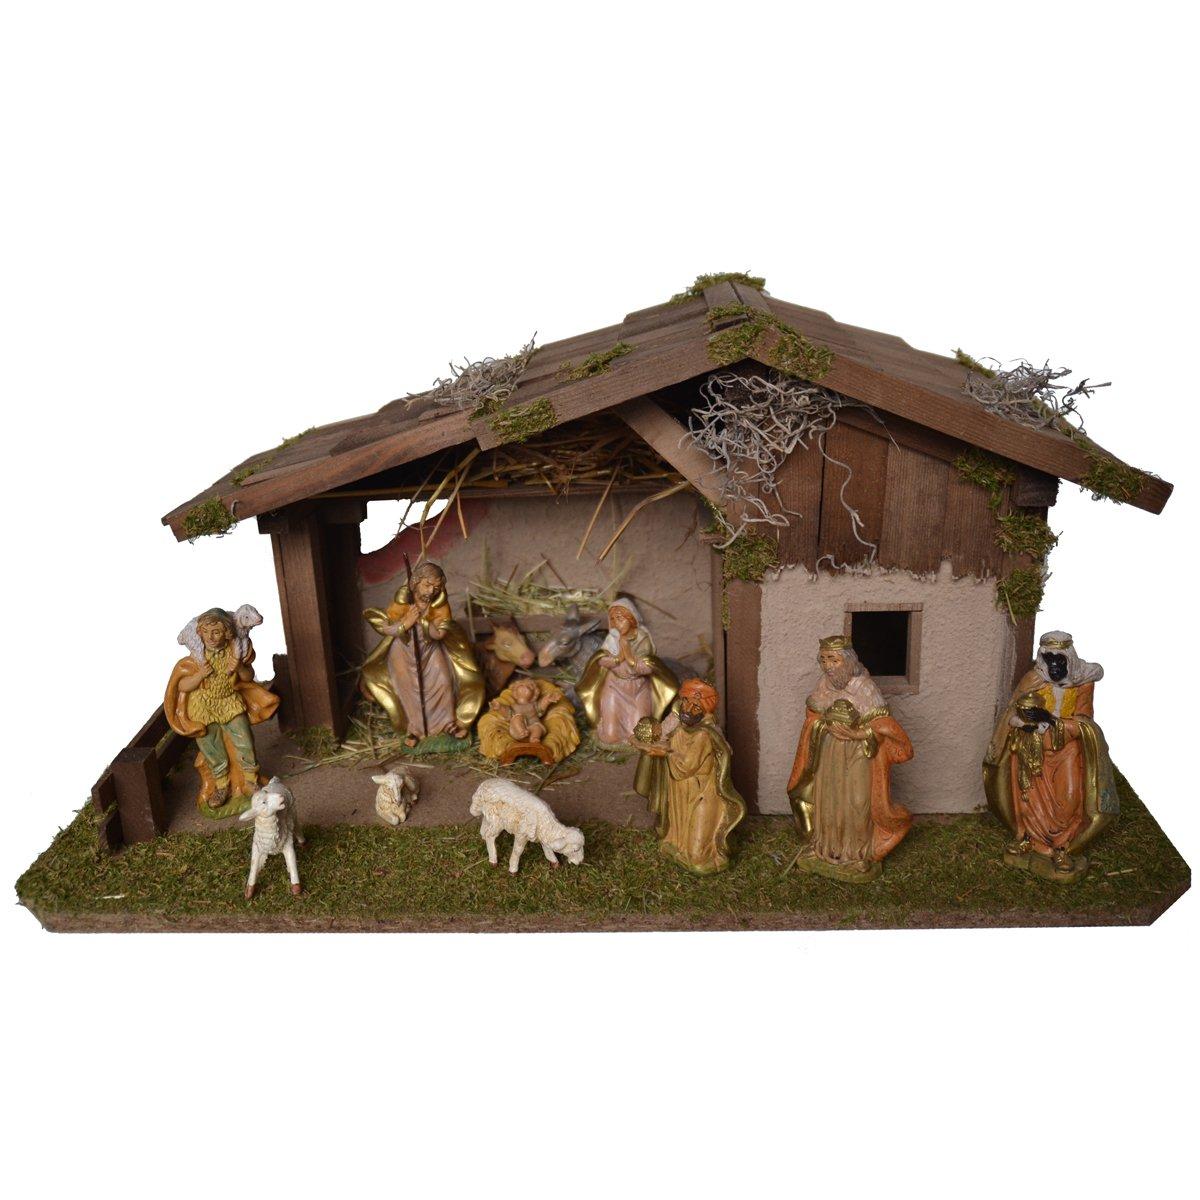 AlfROT Kolbe Krippen 1410 13 Weihnachtskrippe aus aus aus Holz für 11-13 cm Figuren 59 x 30 x 29cm 409156